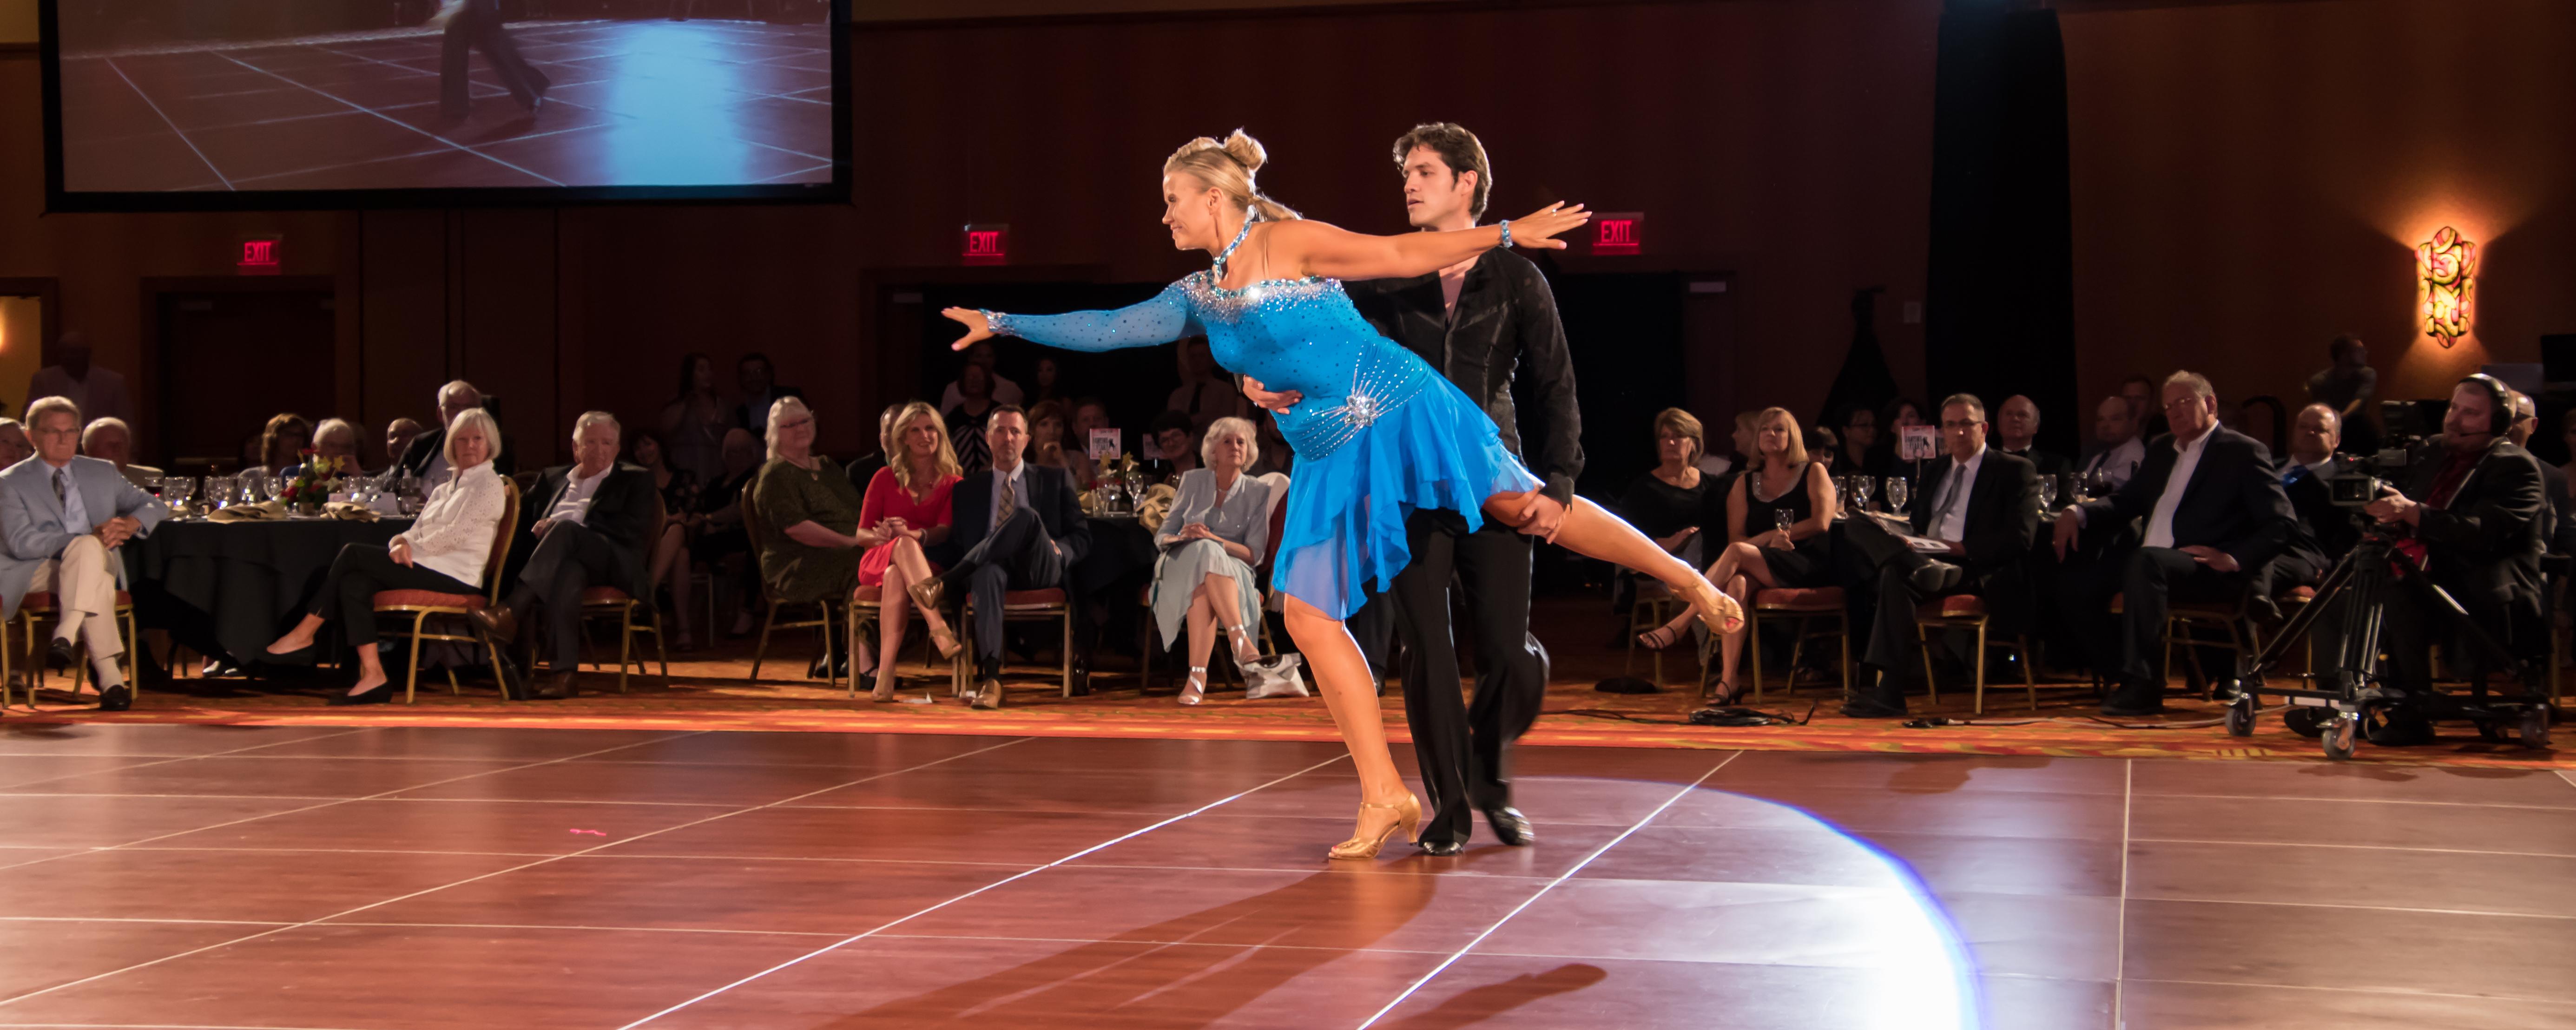 DancingStars2018-7043